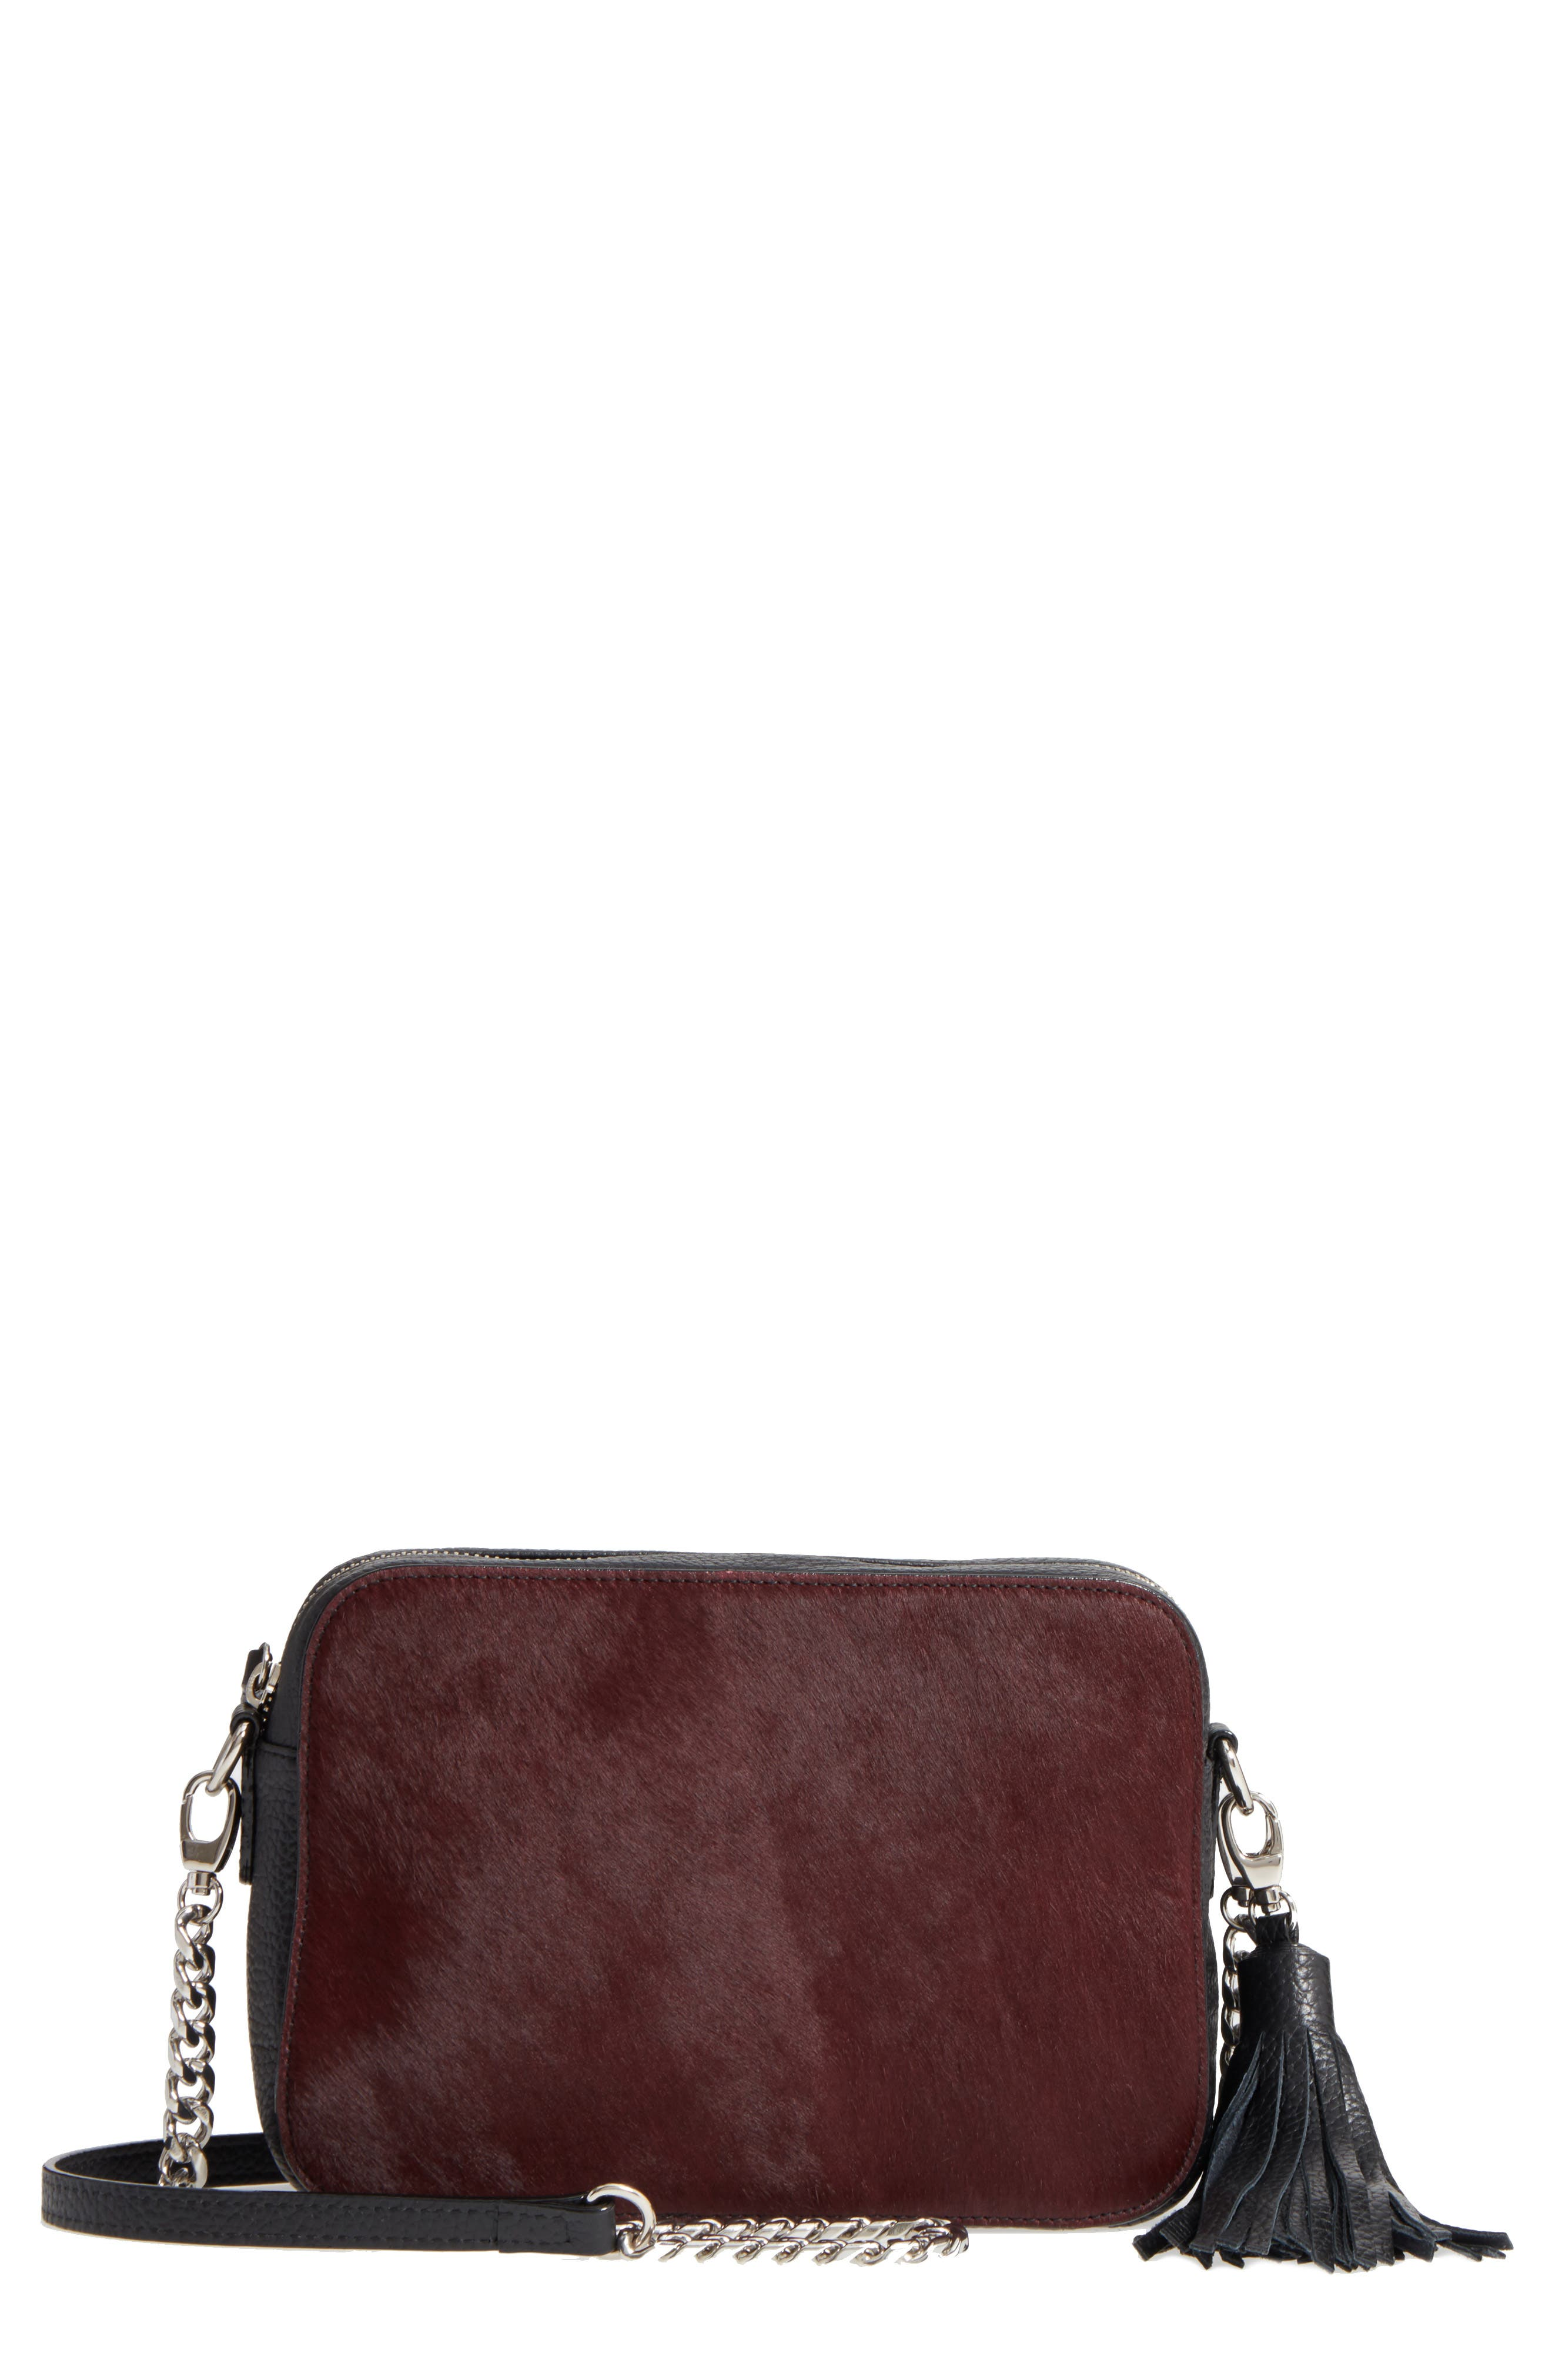 Alternate Image 1 Selected - Nordstrom Ella Leather & Genuine Calf Hair Crossbody Bag